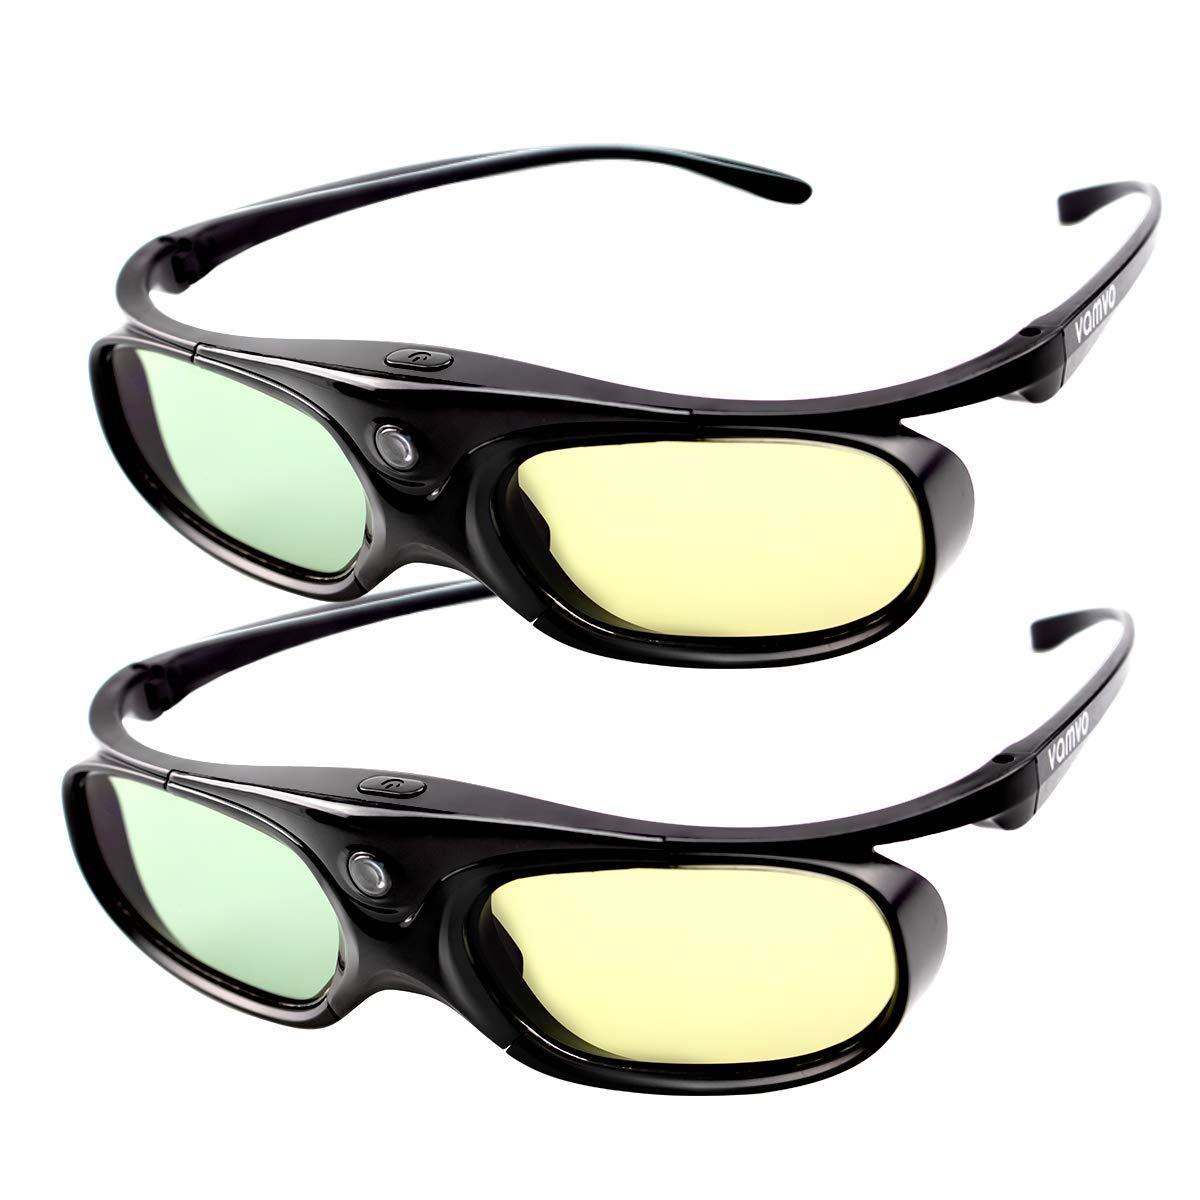 DLP LINK 144 Hz Ultra-Clear HD 3D Glasses,Vamvo Active Rechargeable 3D Shutter Glasses for All 3D DLP Projectors - BenQ, Optoma, Dell, Mitsubishi, Samsung, Acer, Vivitek, NEC, Sharp, ViewSonic & Endle